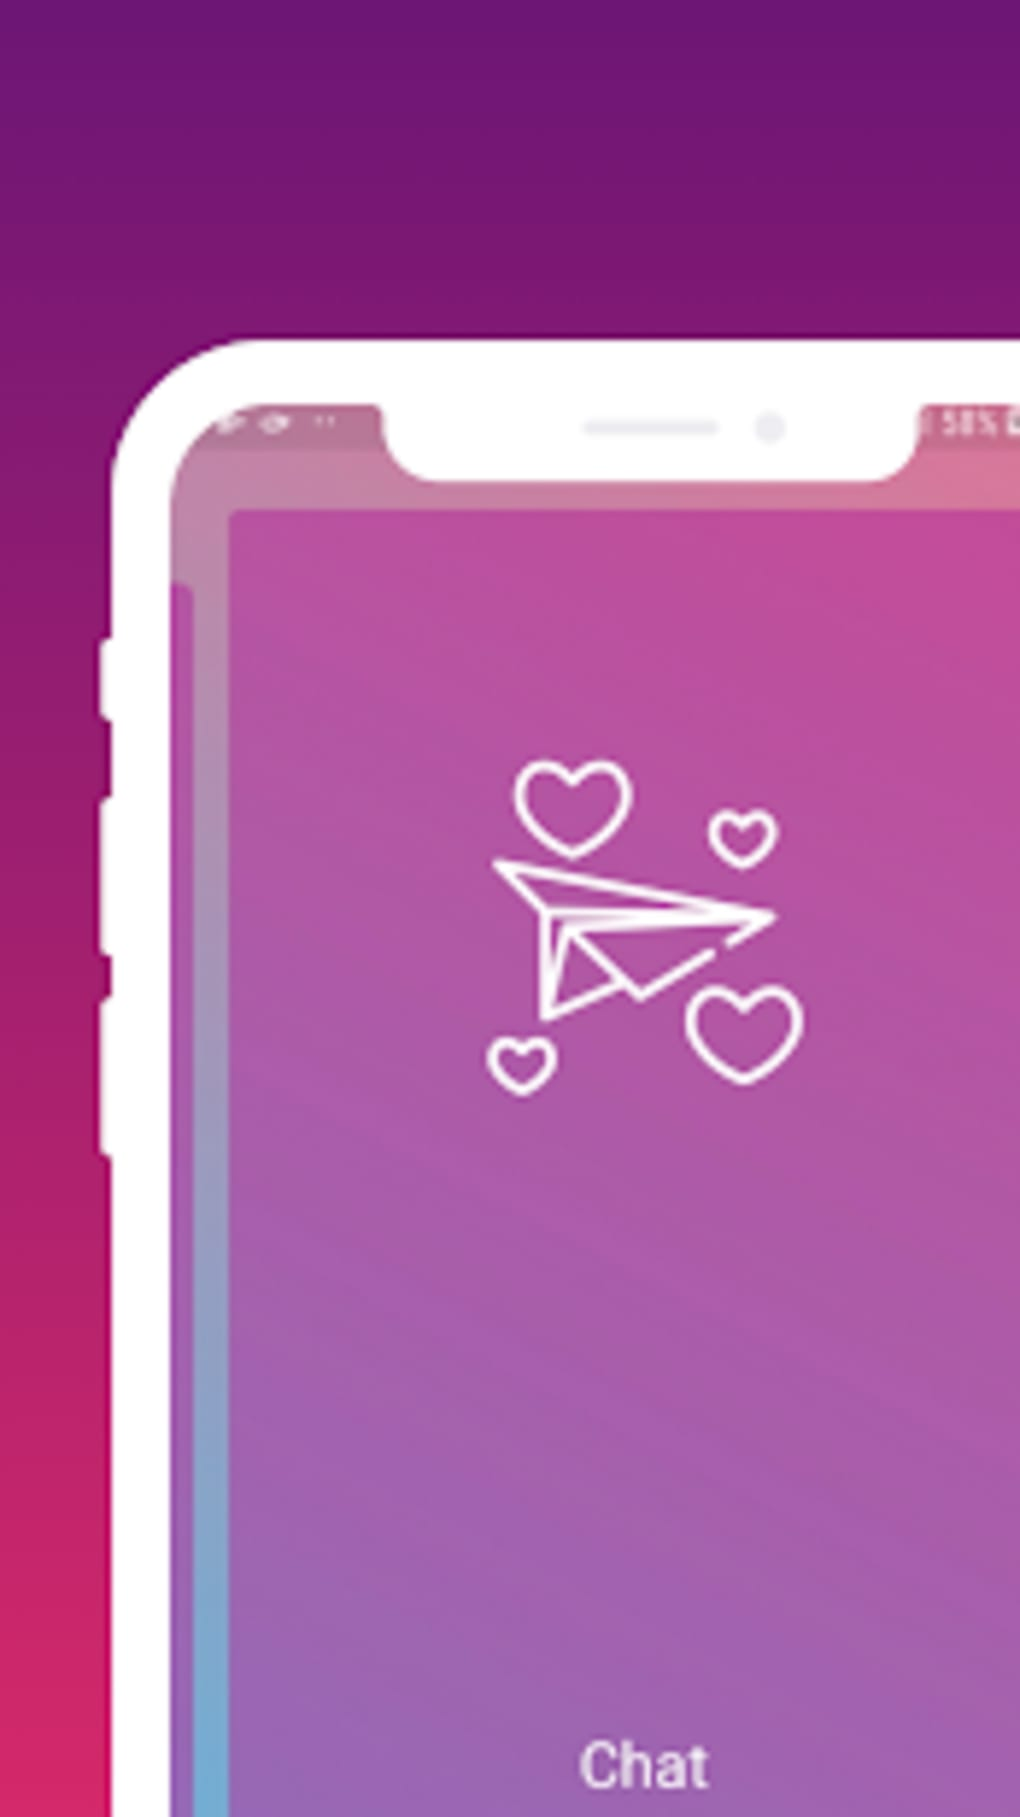 Android app online dating mobiili dating ole rekisteröityä